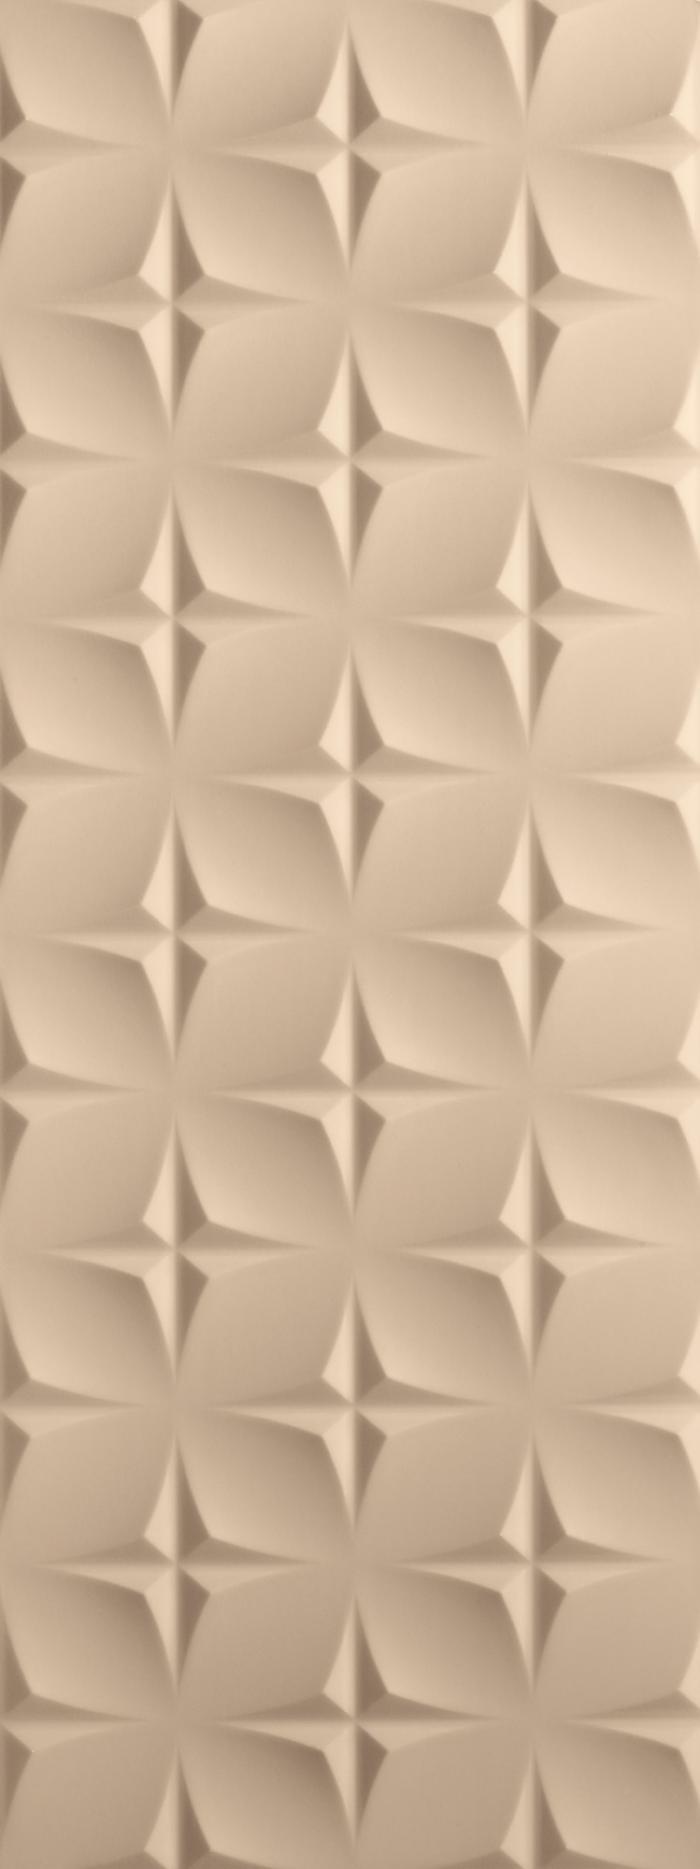 Genesis Stellar Sand